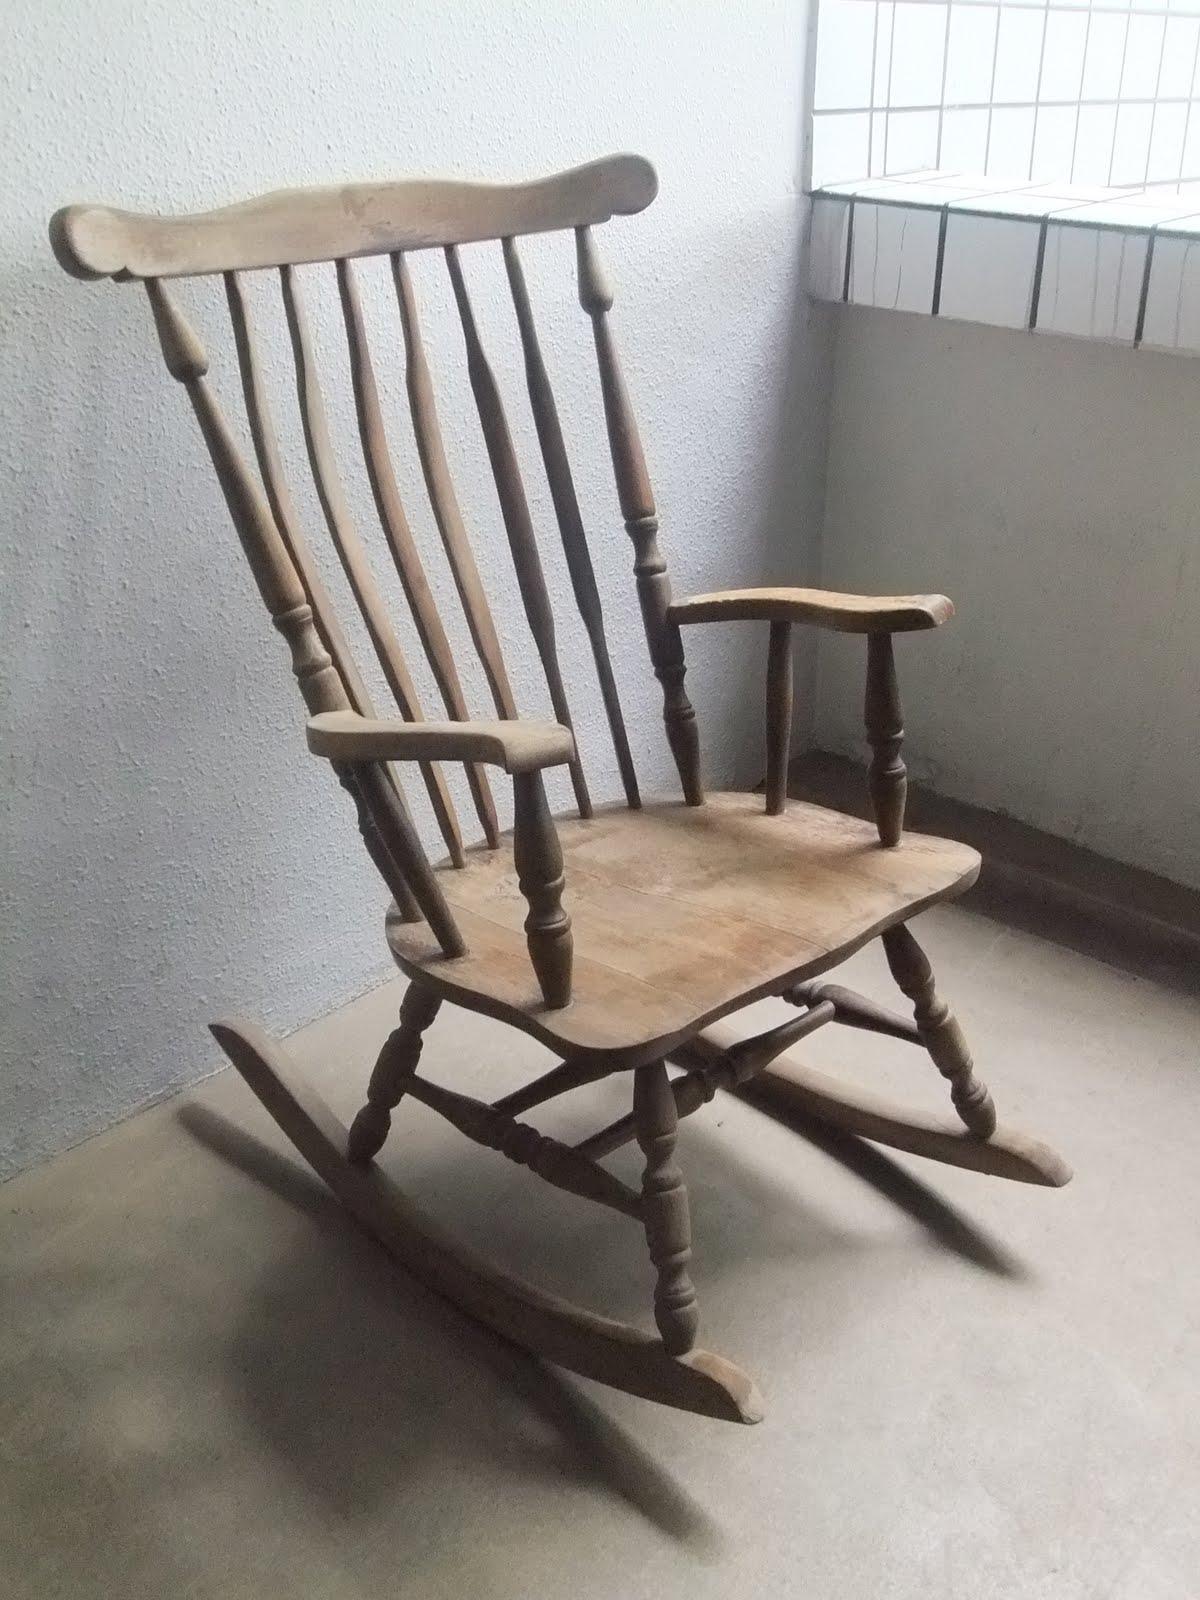 vintage furniture at second charm a great year of blogging ashley furniture. Black Bedroom Furniture Sets. Home Design Ideas